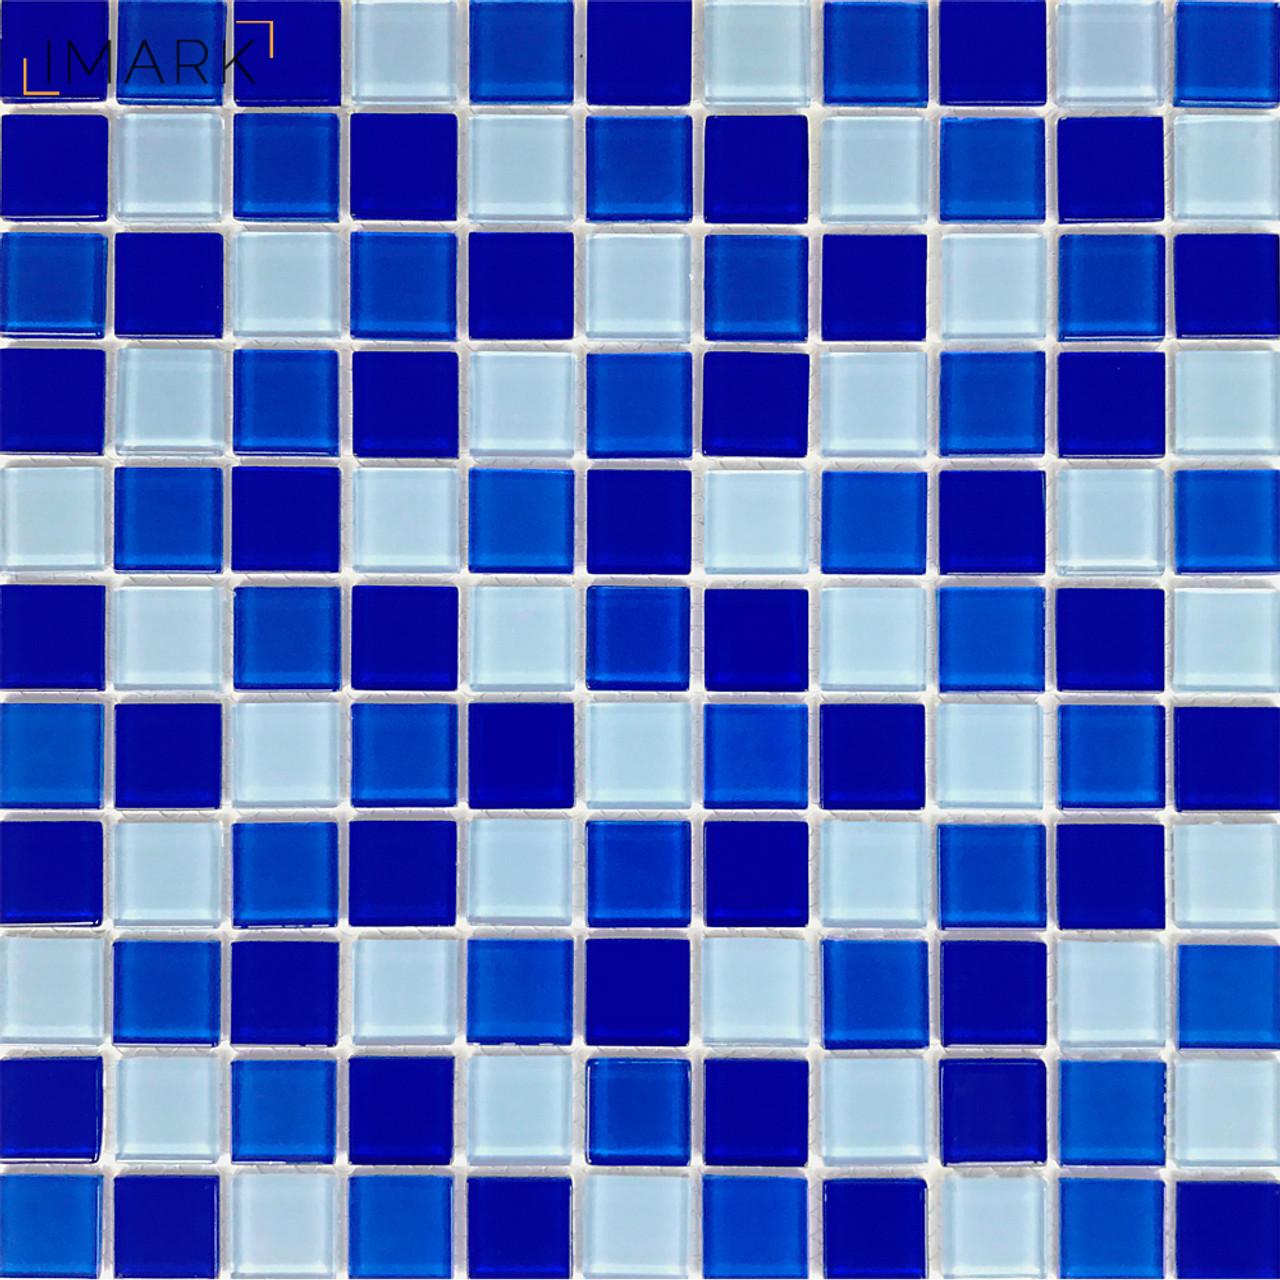 - Cobalt Blue Glass Mosaic Tile Backsplash For Kitchen Wall Stickers